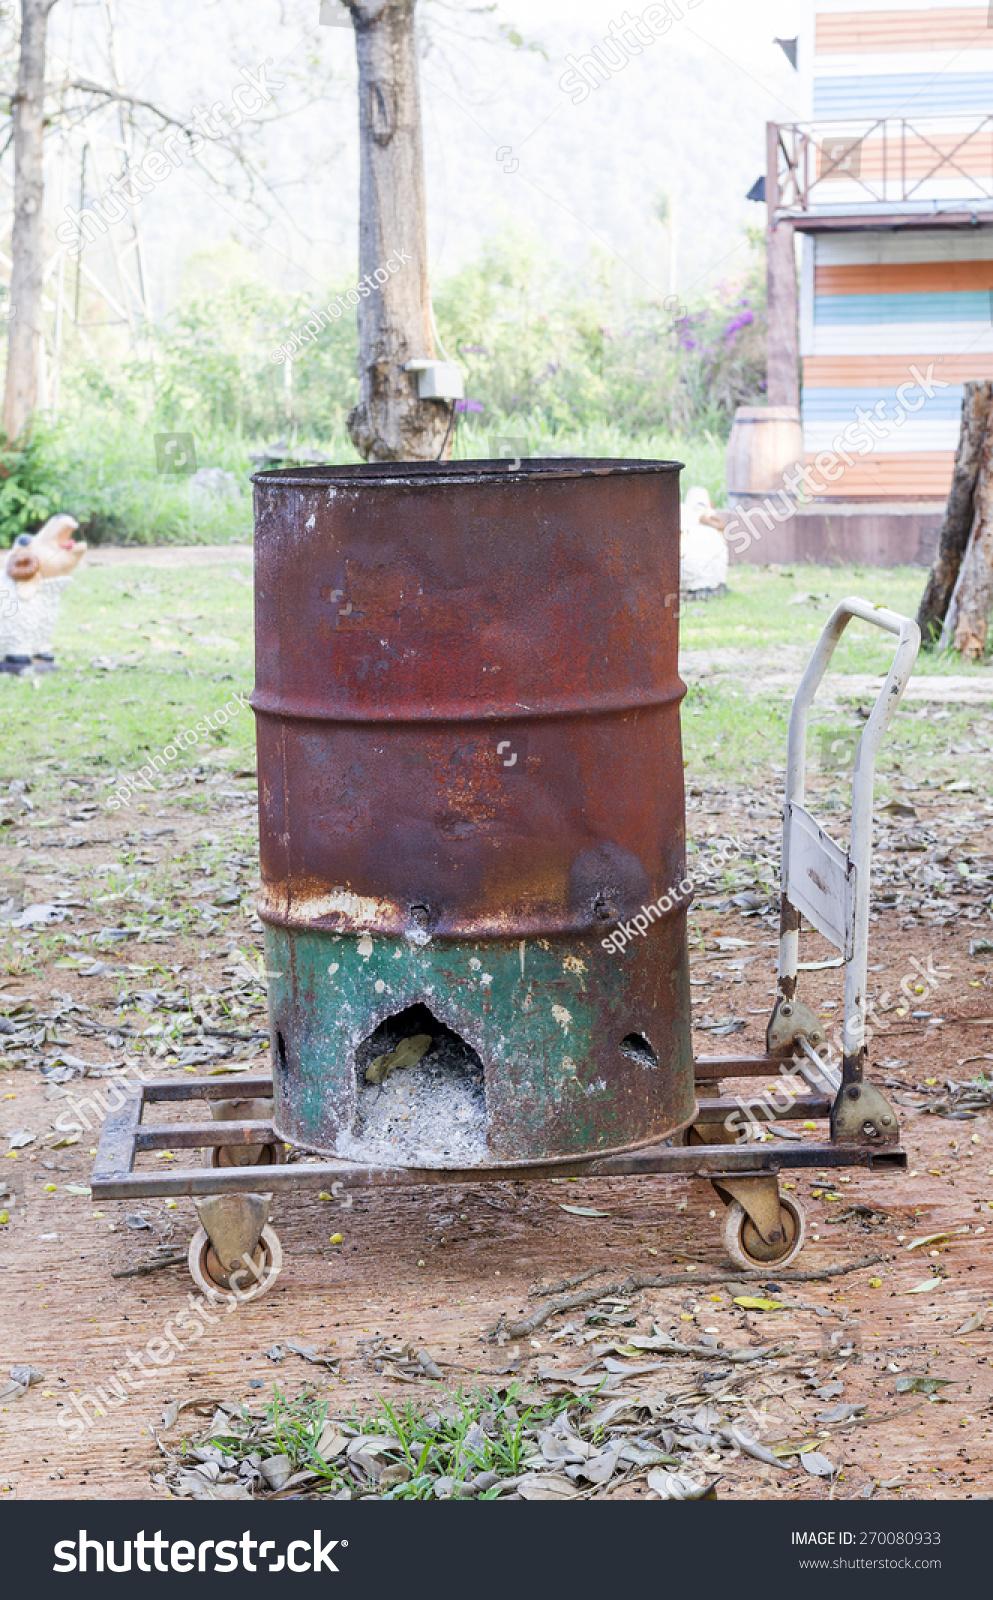 Diy Homemade Backyard Incinerator Good Idea Stock Photo